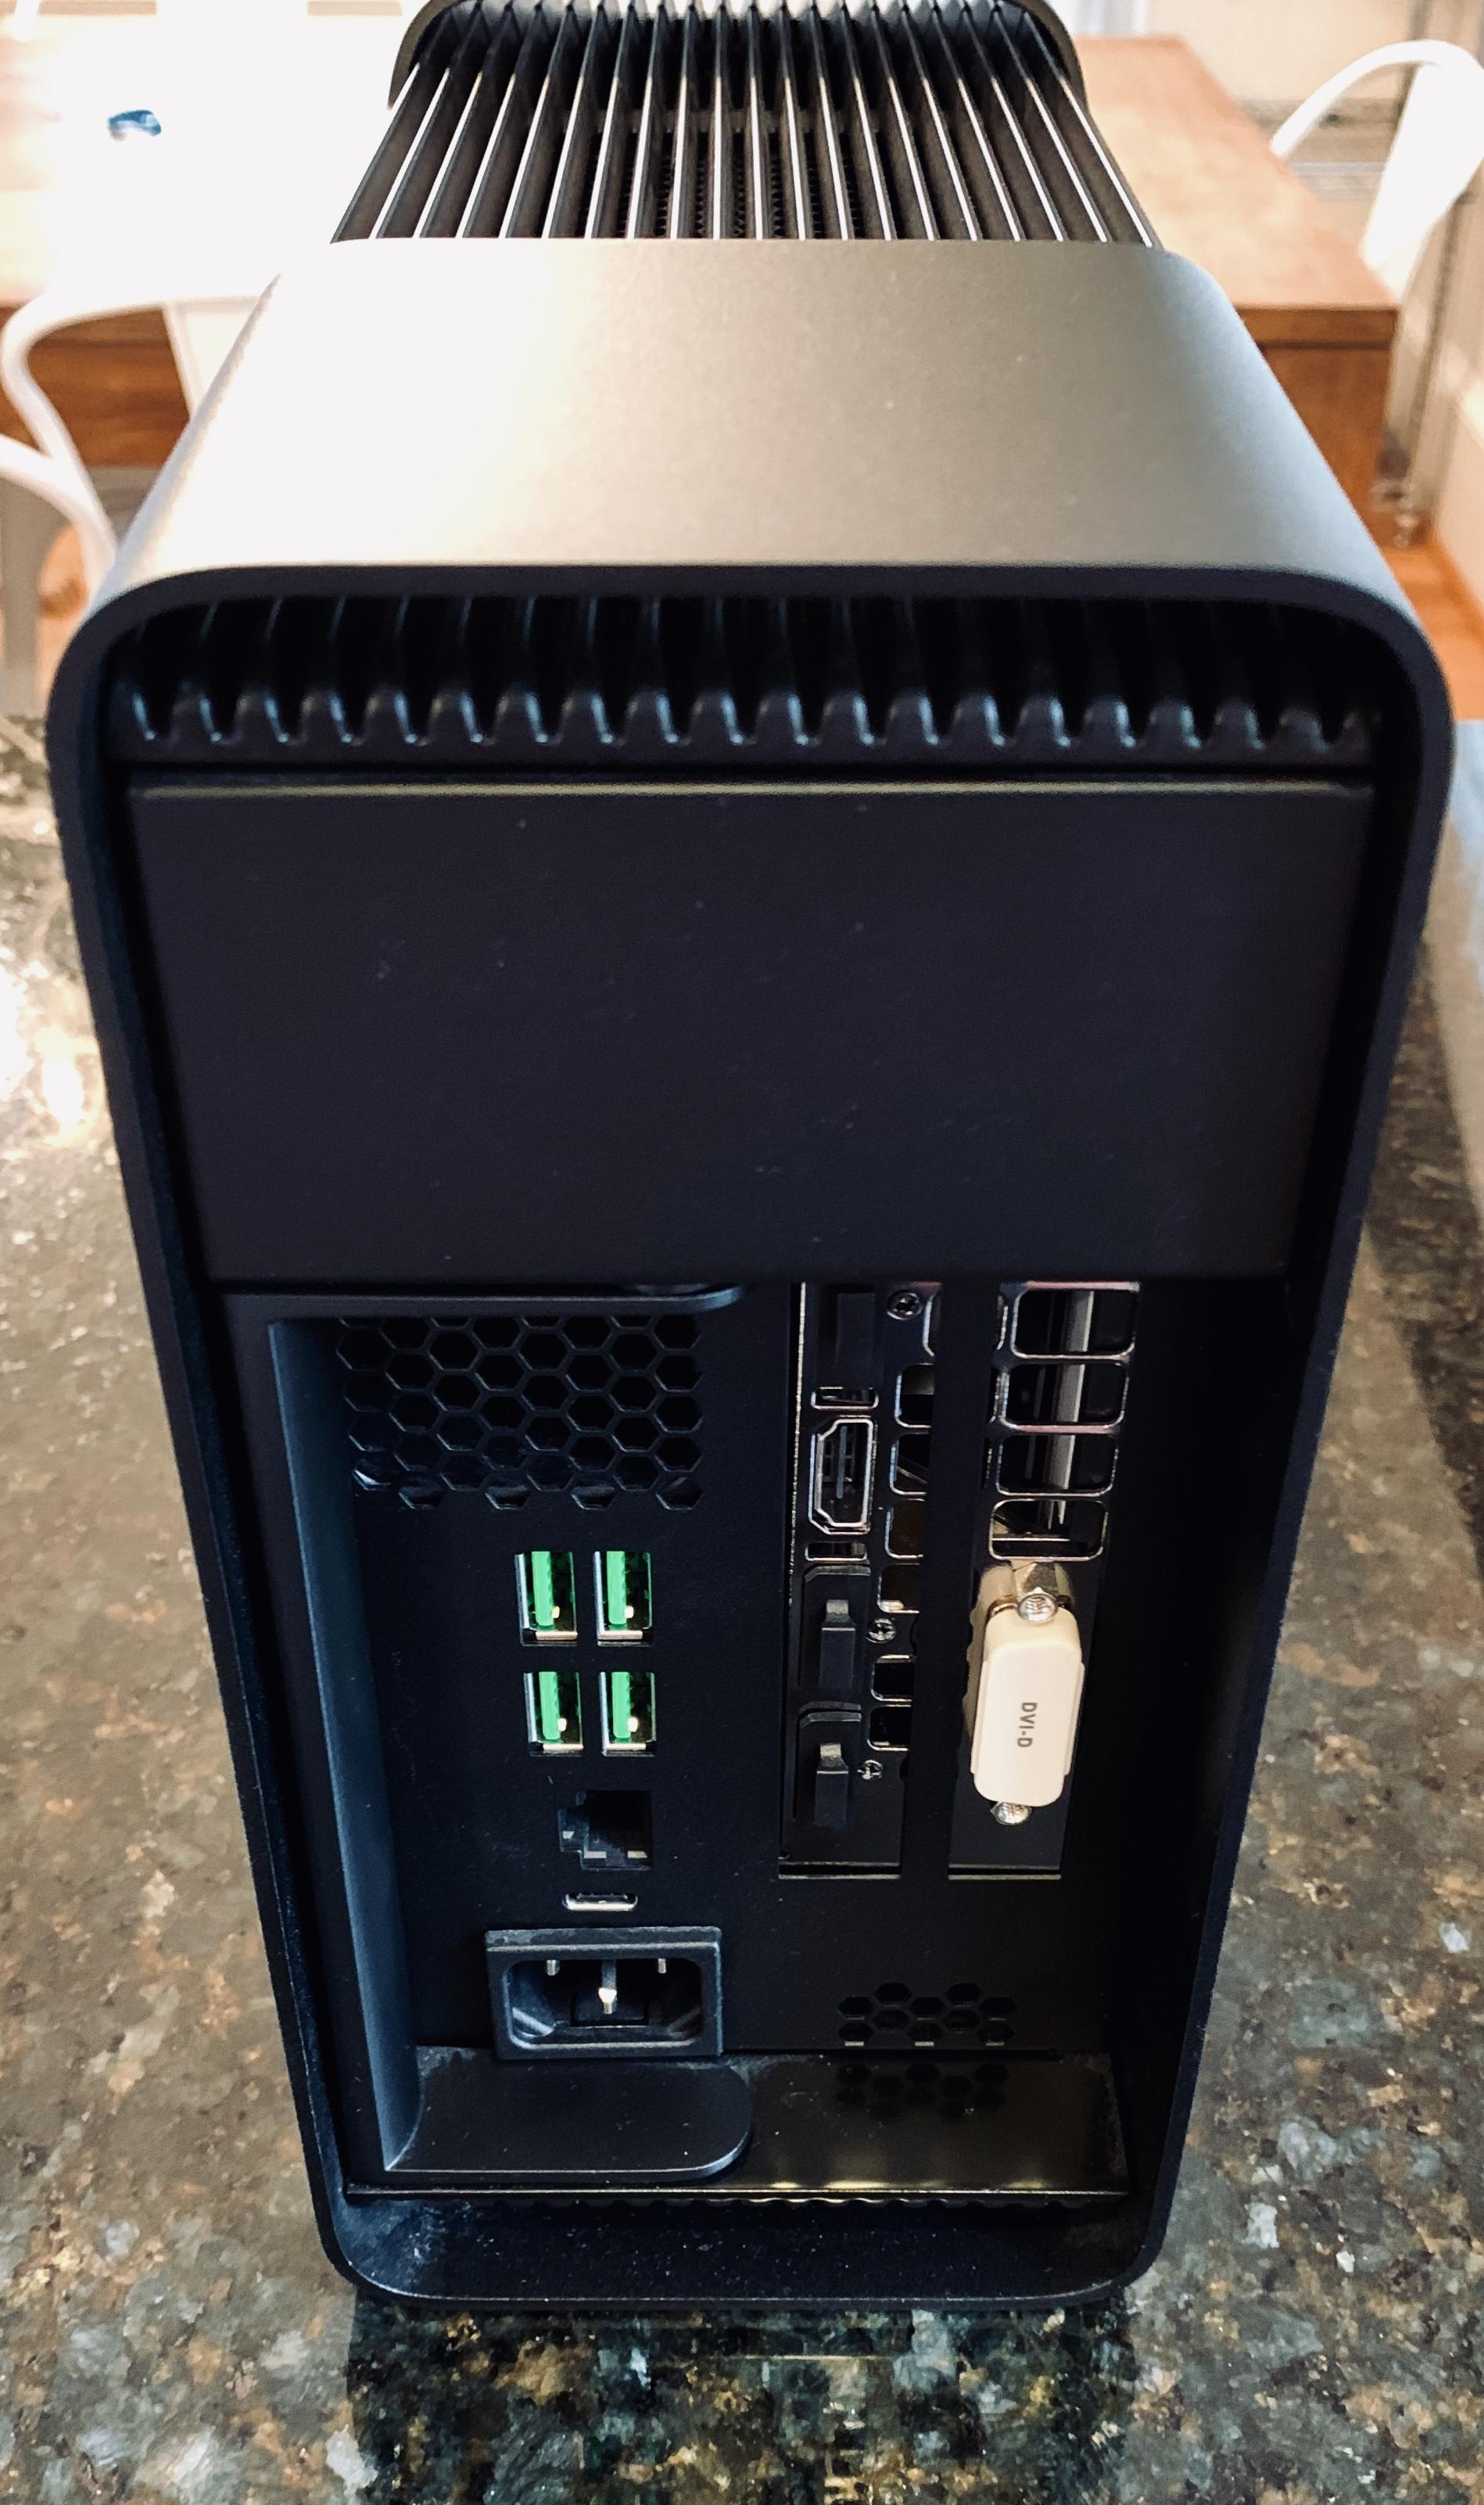 Razer Core external GPU enclosure + EVGA GTX 1070 | Headphone